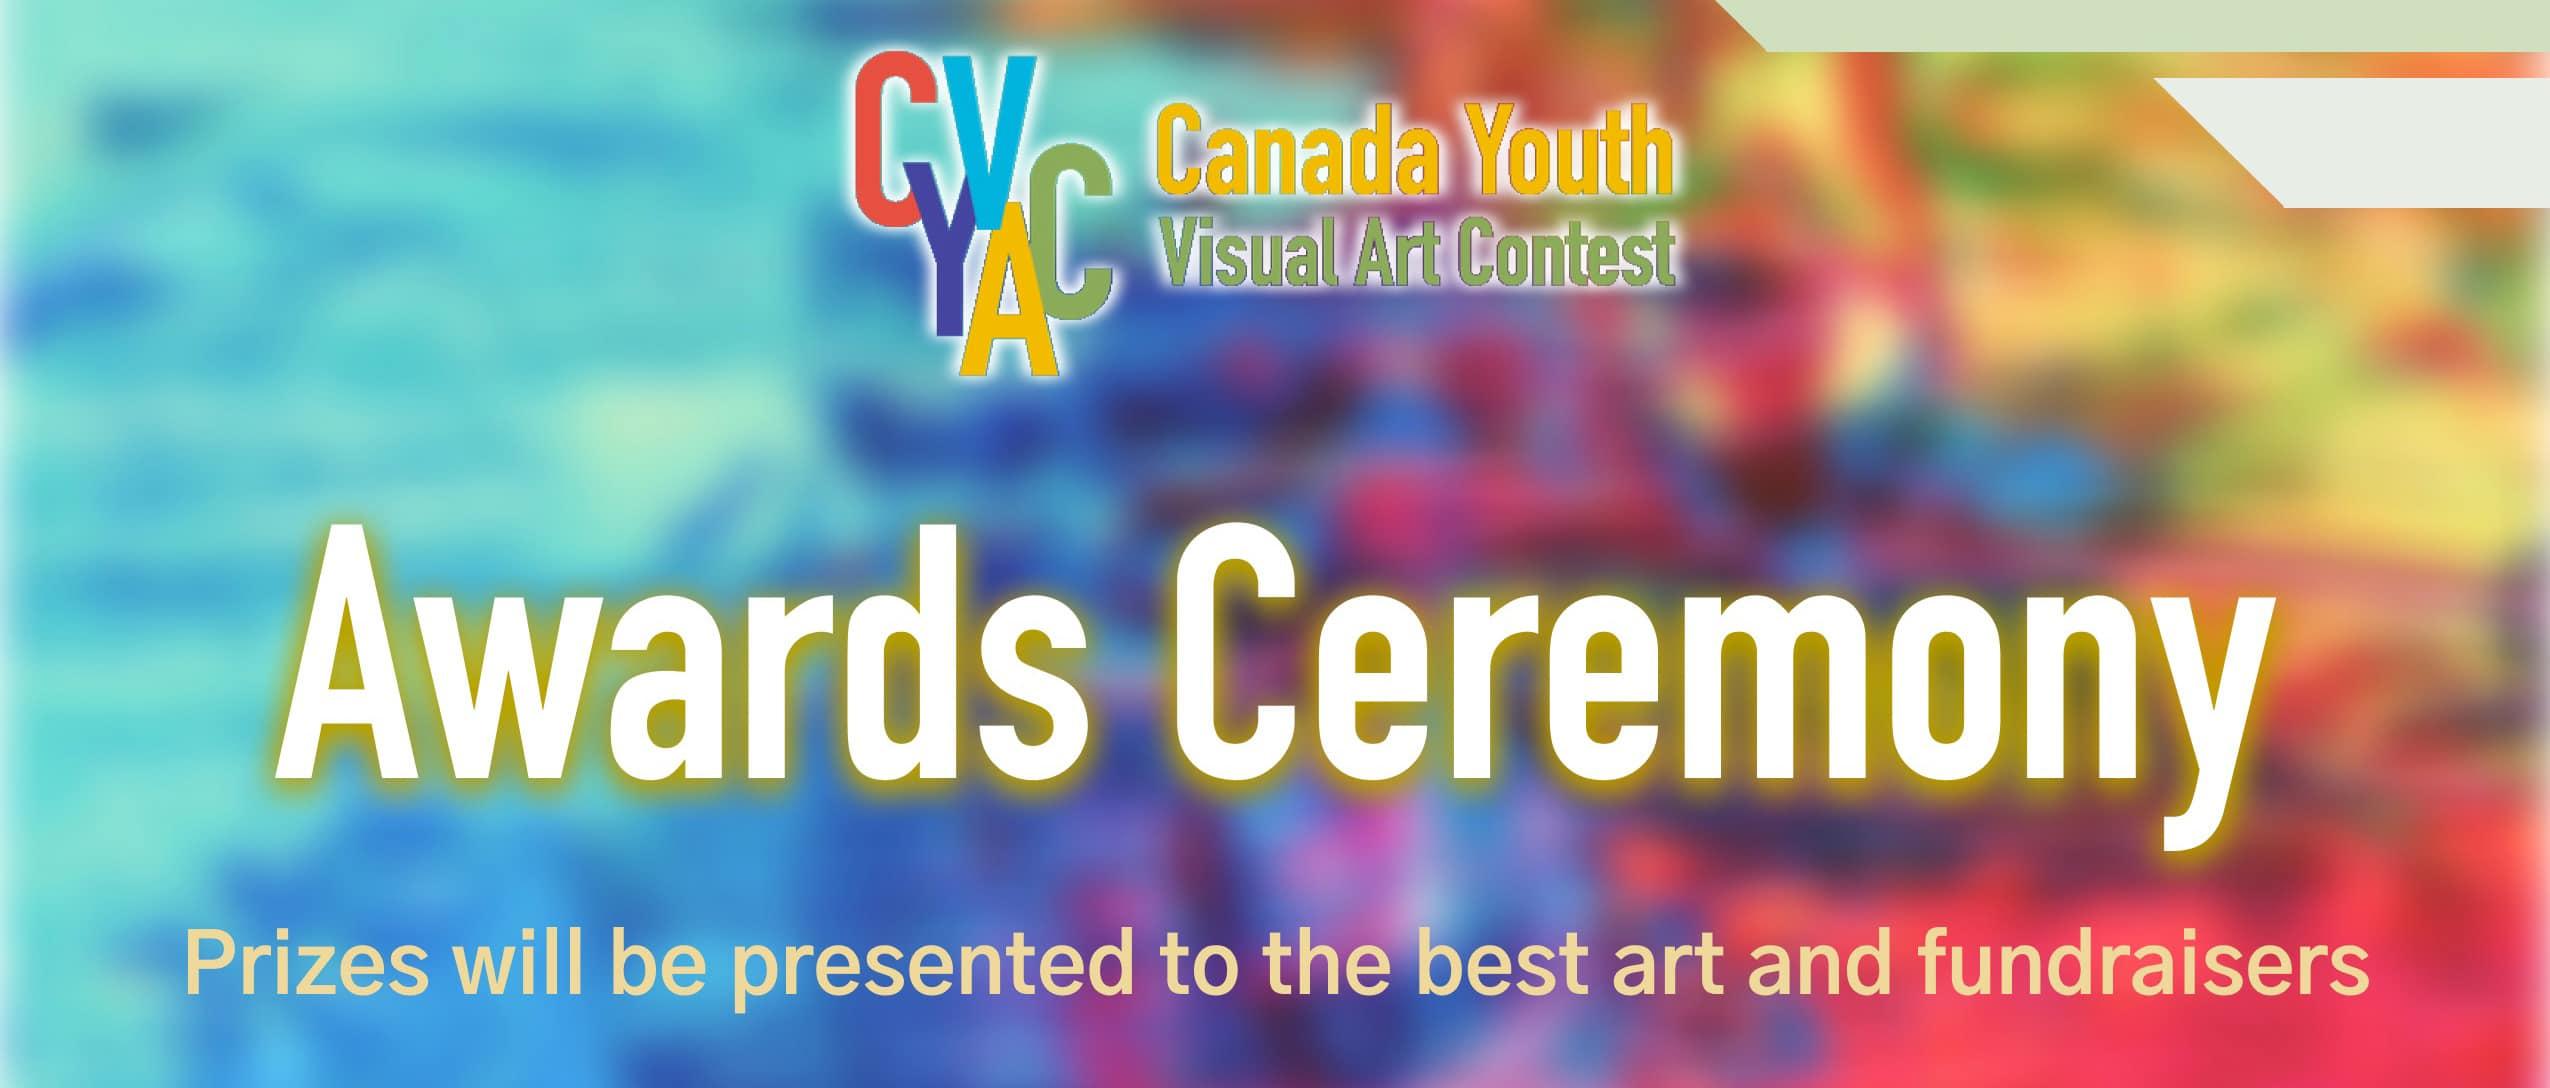 CYVAC Award Ceremony